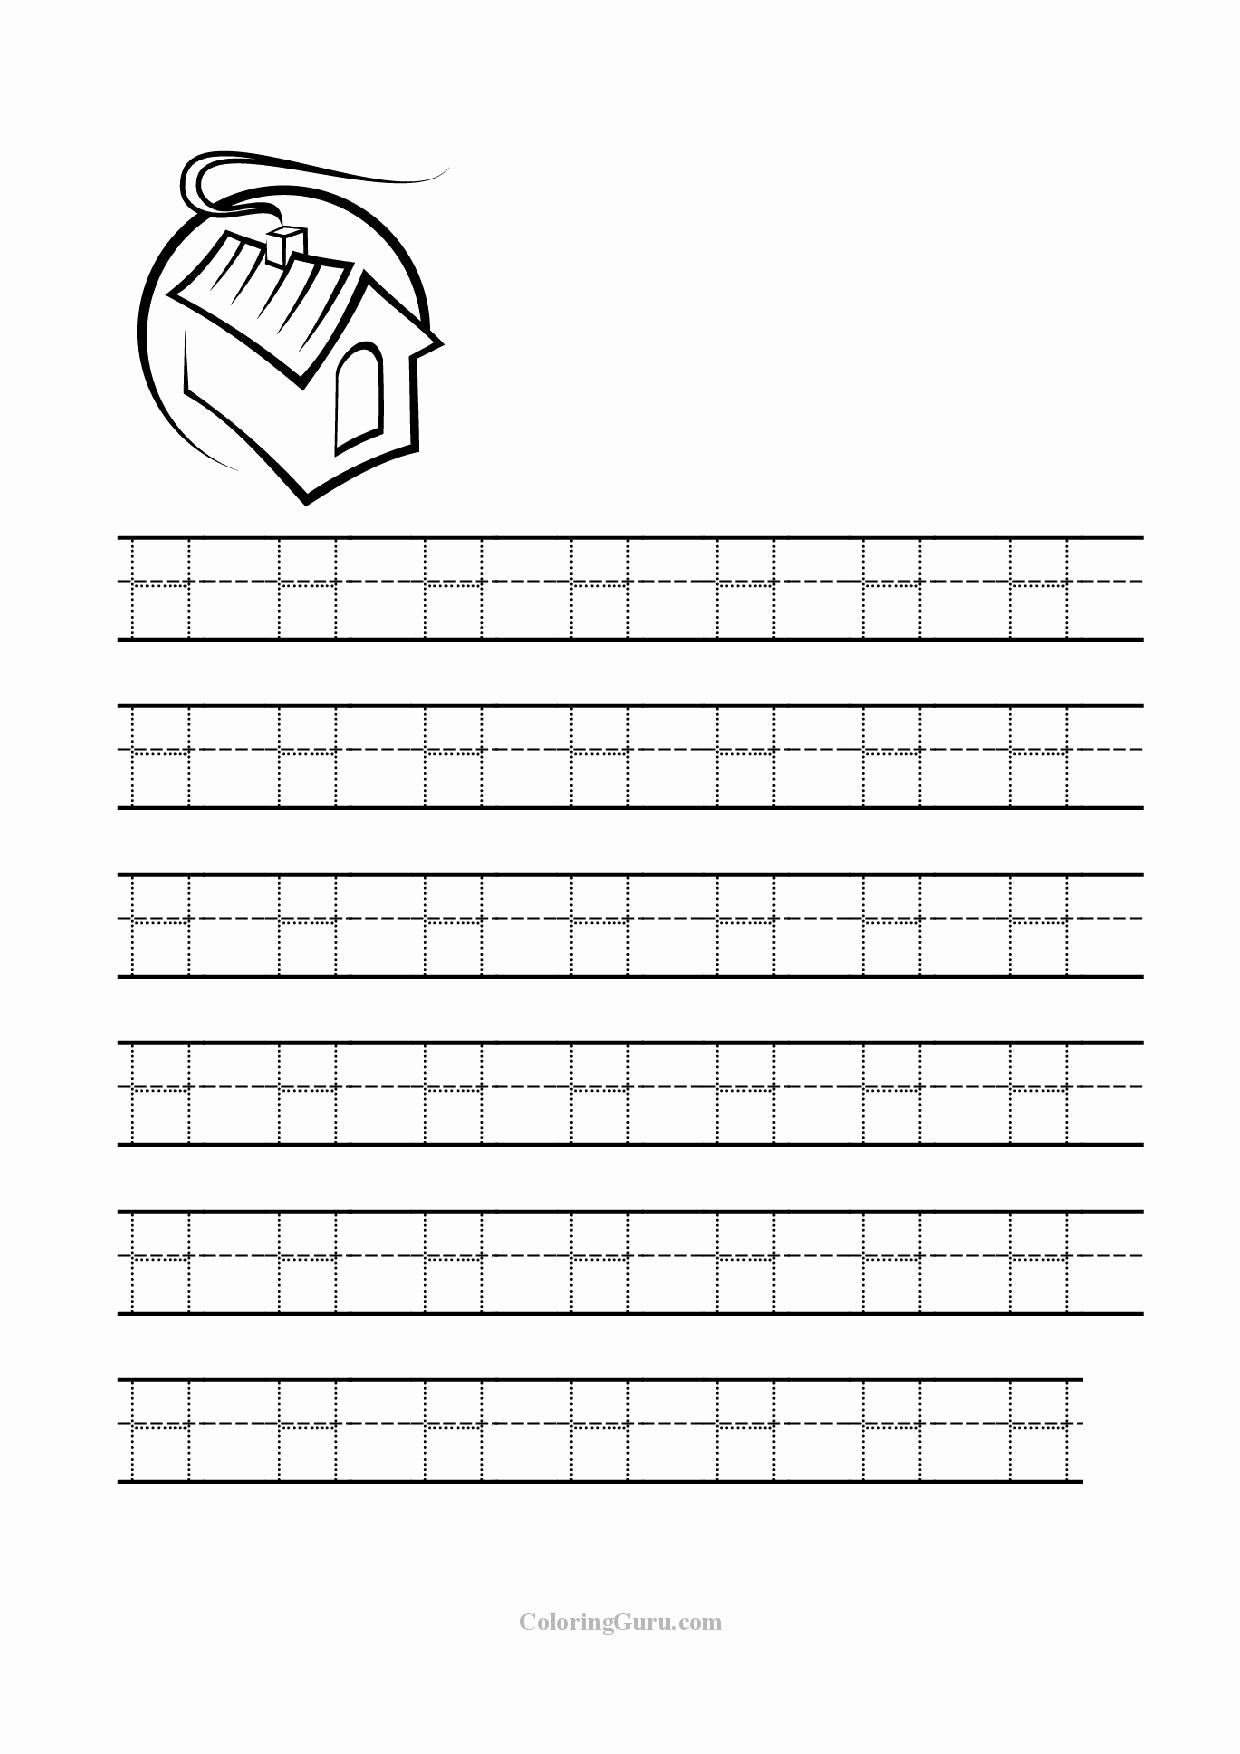 Letter H Tracing Worksheets Preschool top Free Printable Tracing Letter H Worksheets for Preschool